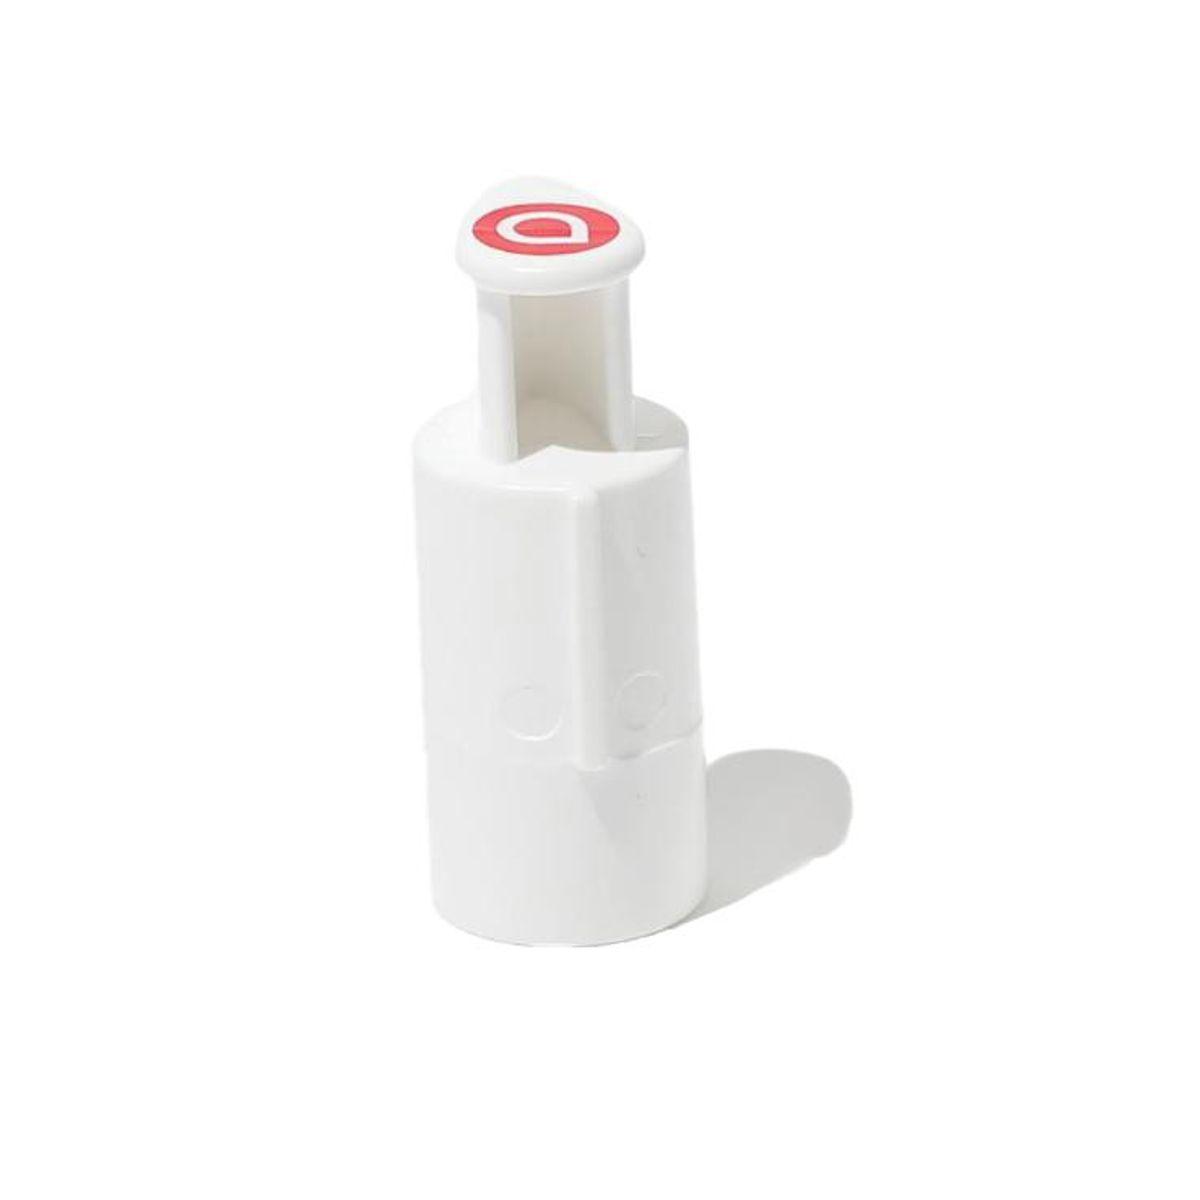 droplette retinol capsules